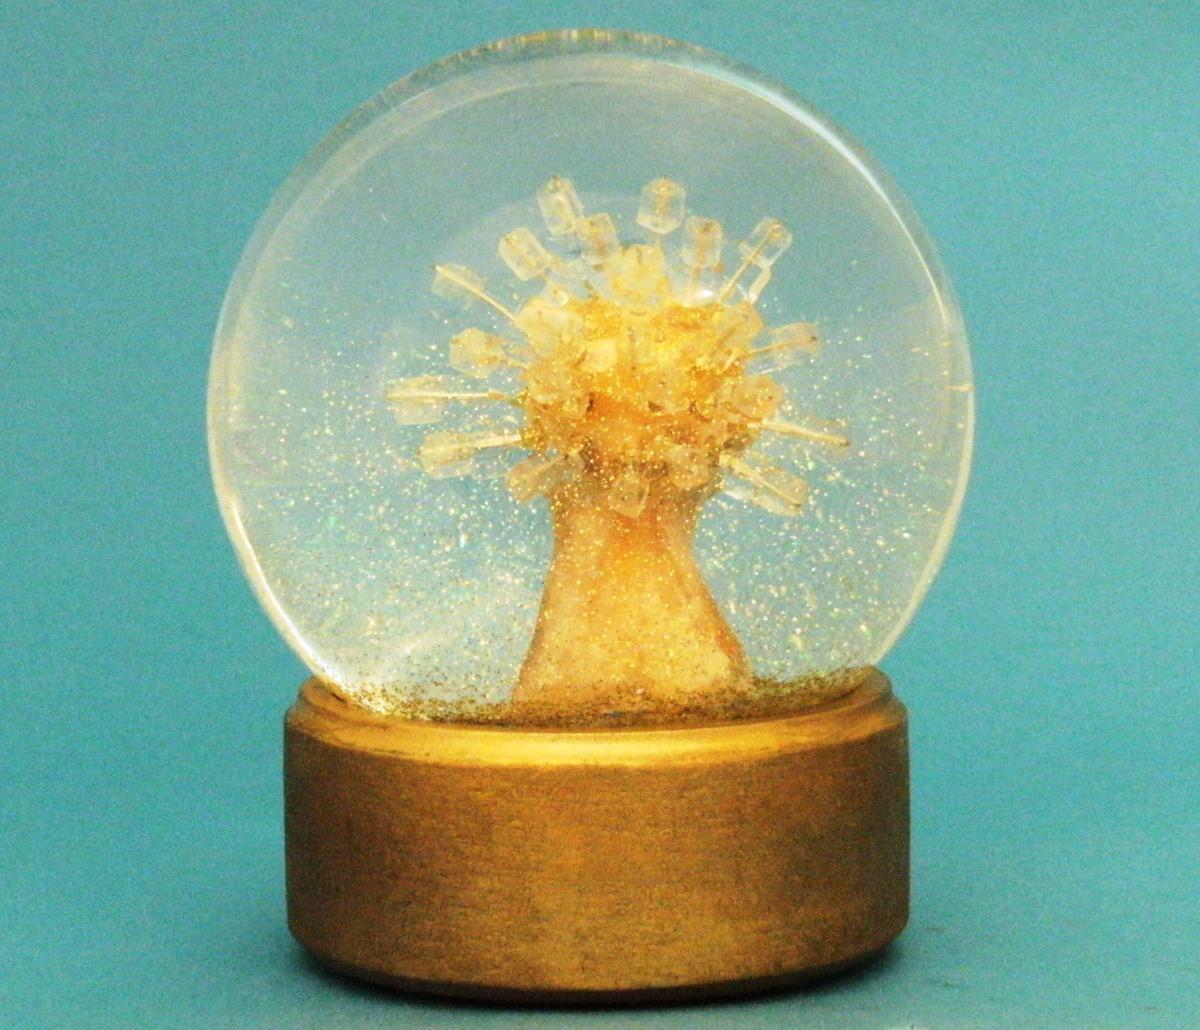 CHILL snow globe, Camryn Forrest Designs, 2015